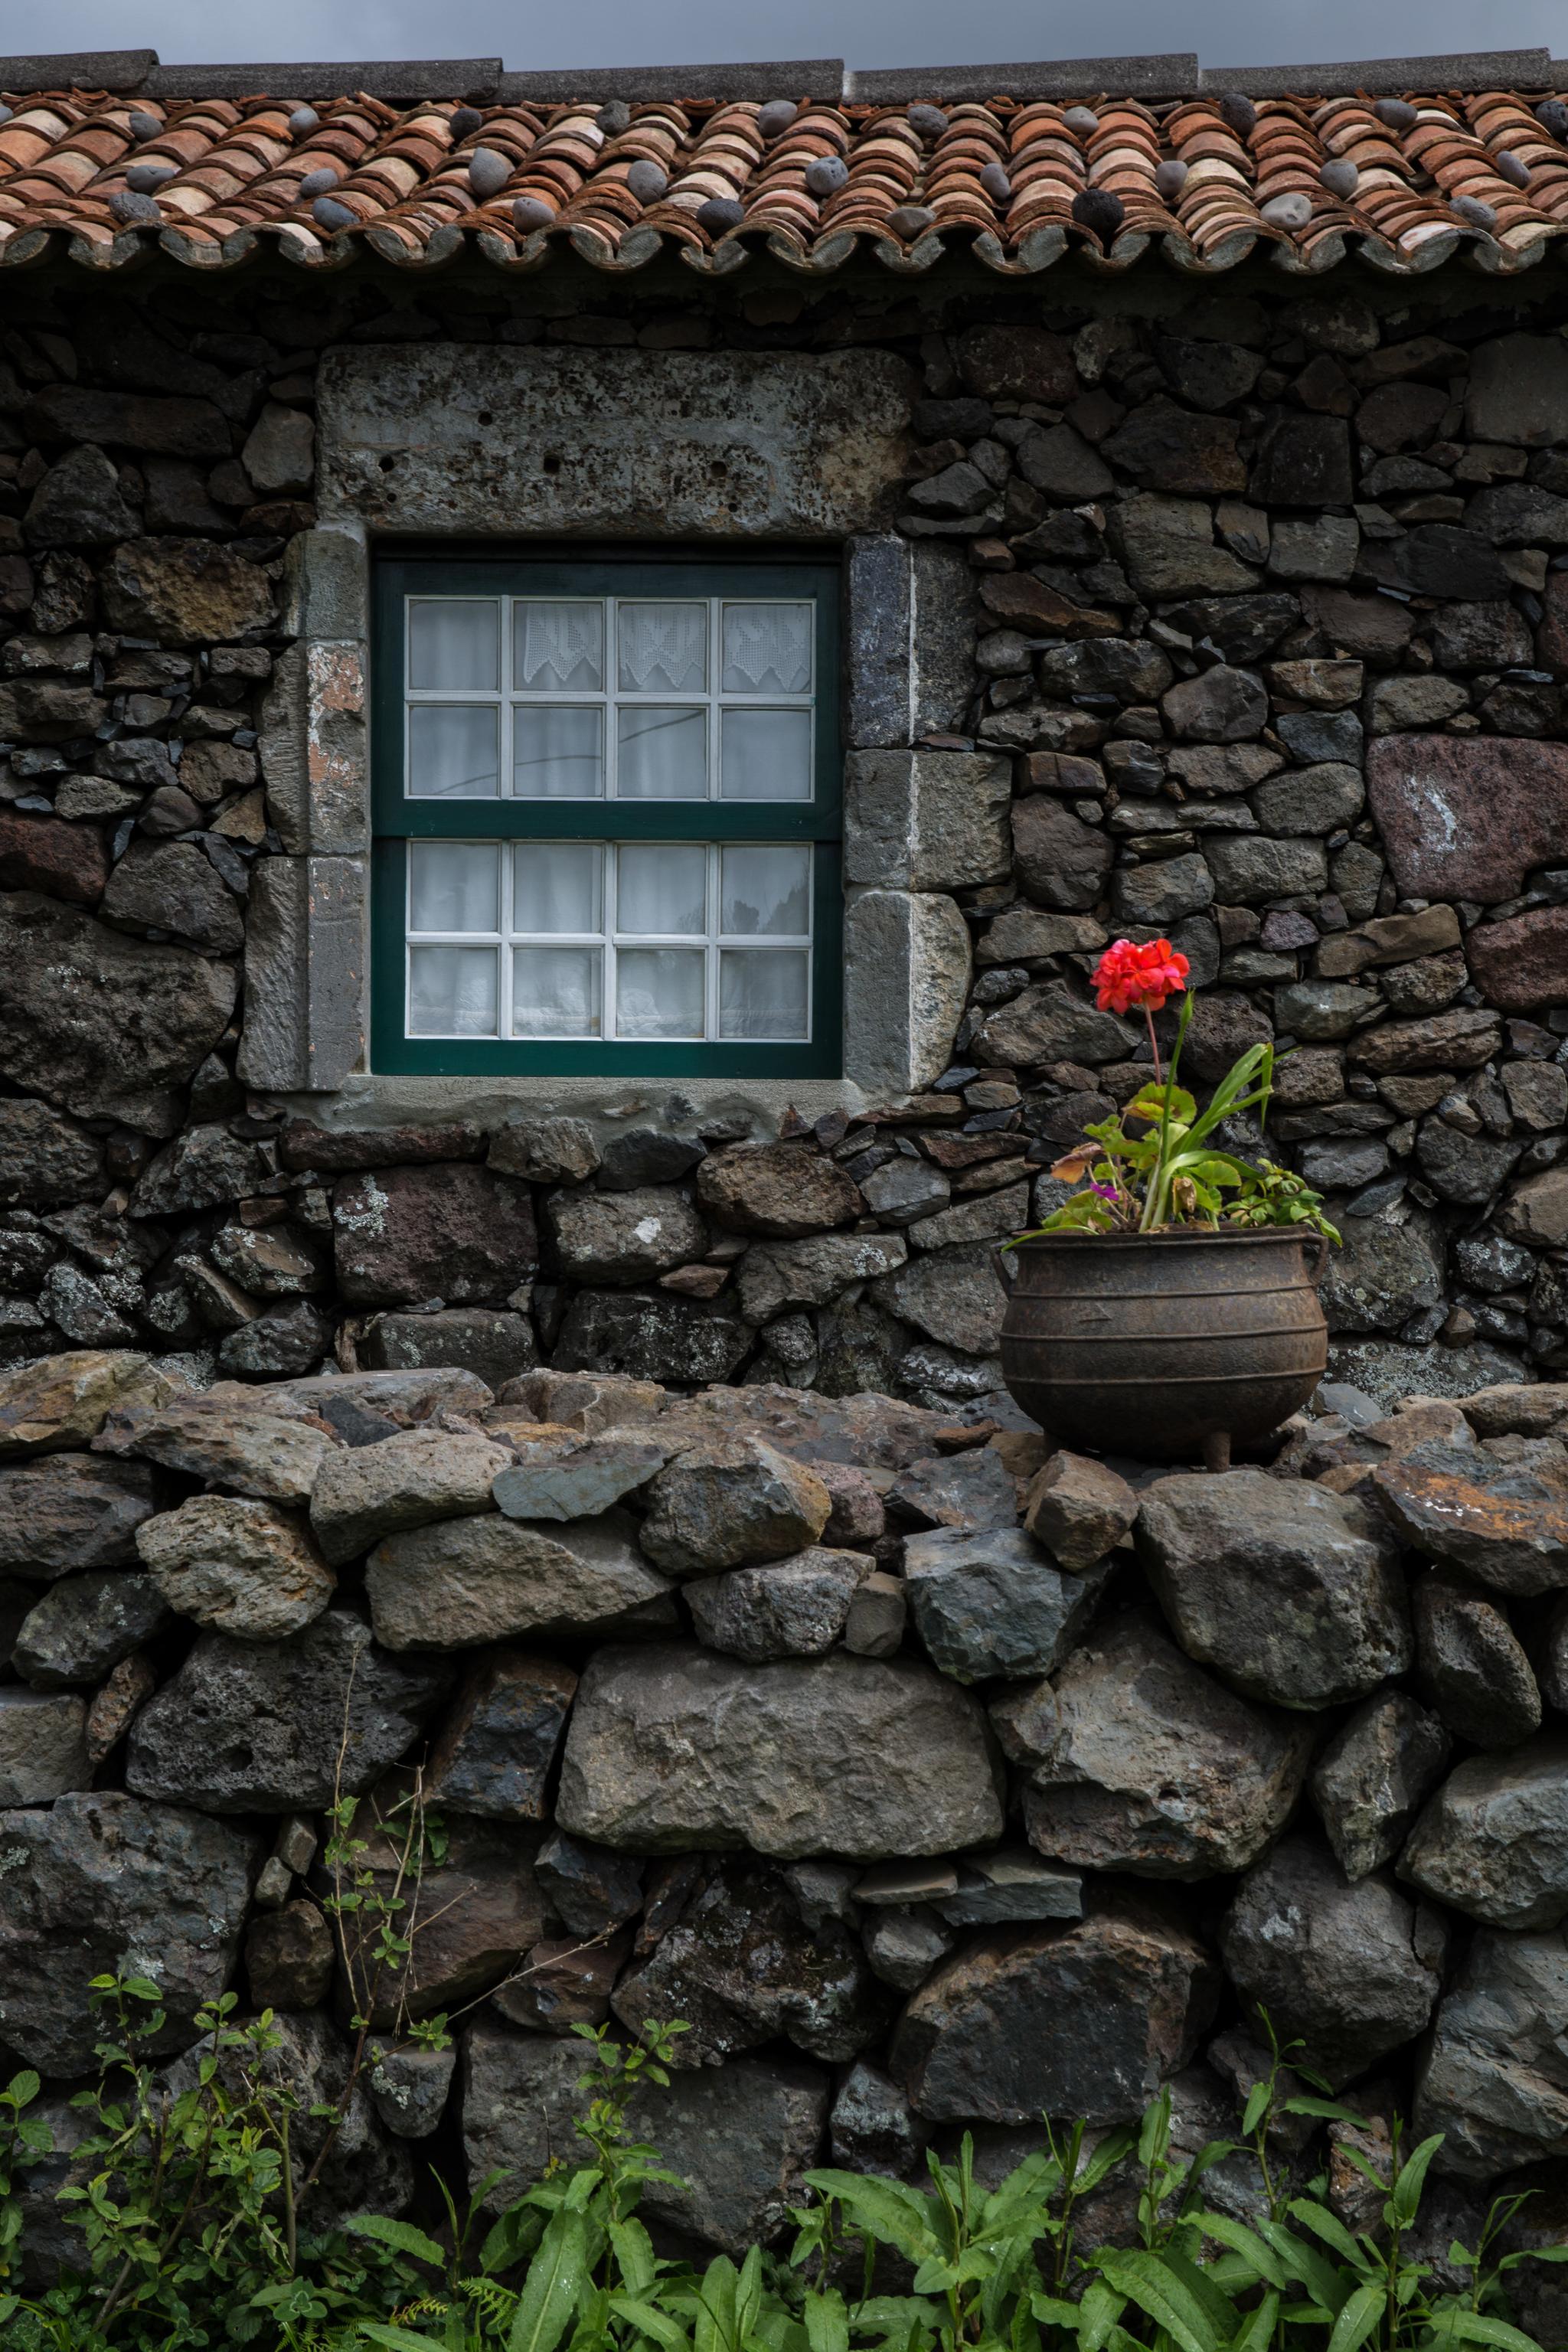 LB aldeia da cuada Acores Ilha Flores 20-04-17 9234.jpg